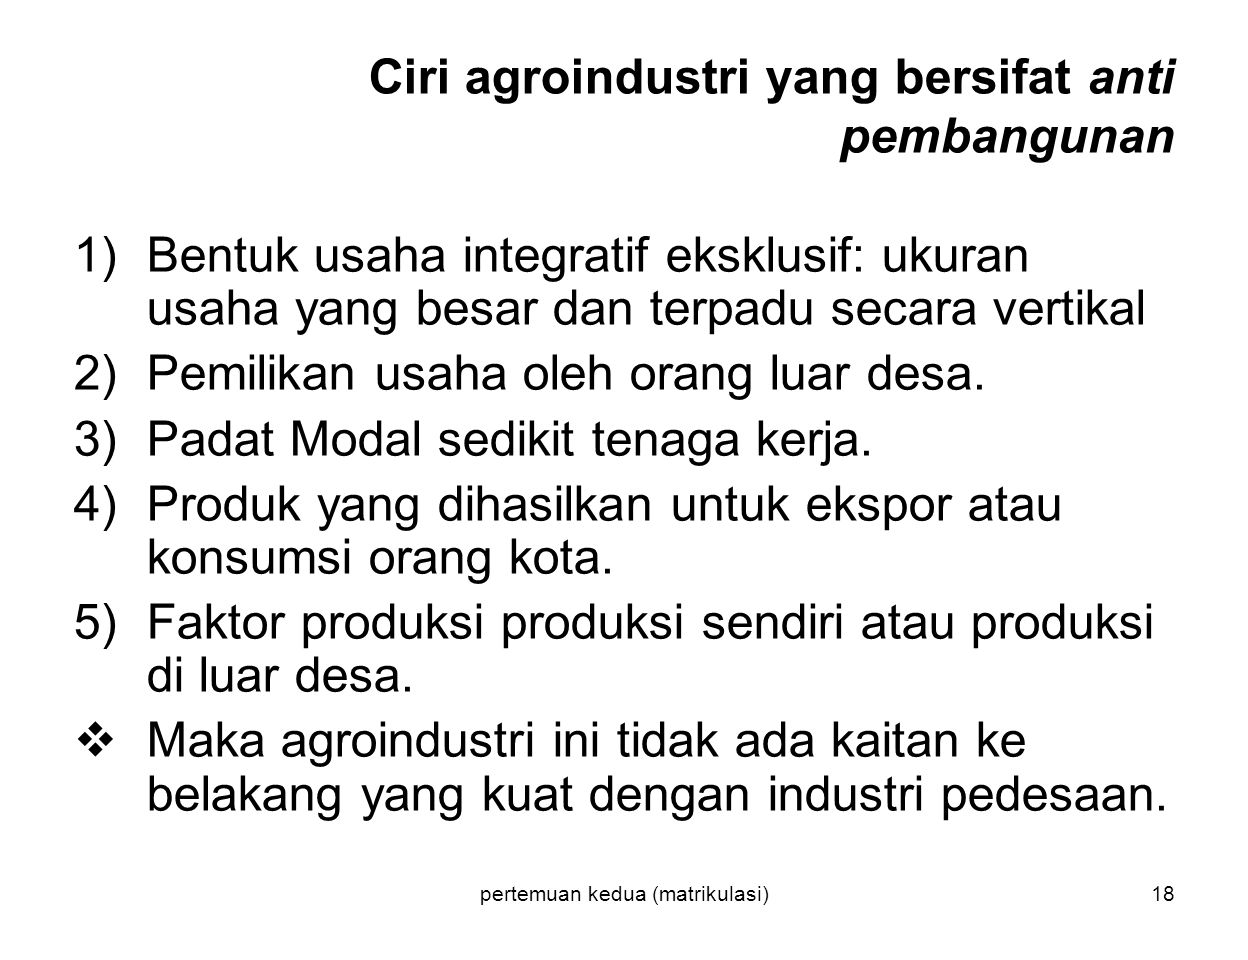 Ciri agroindustri yang bersifat anti pembangunan